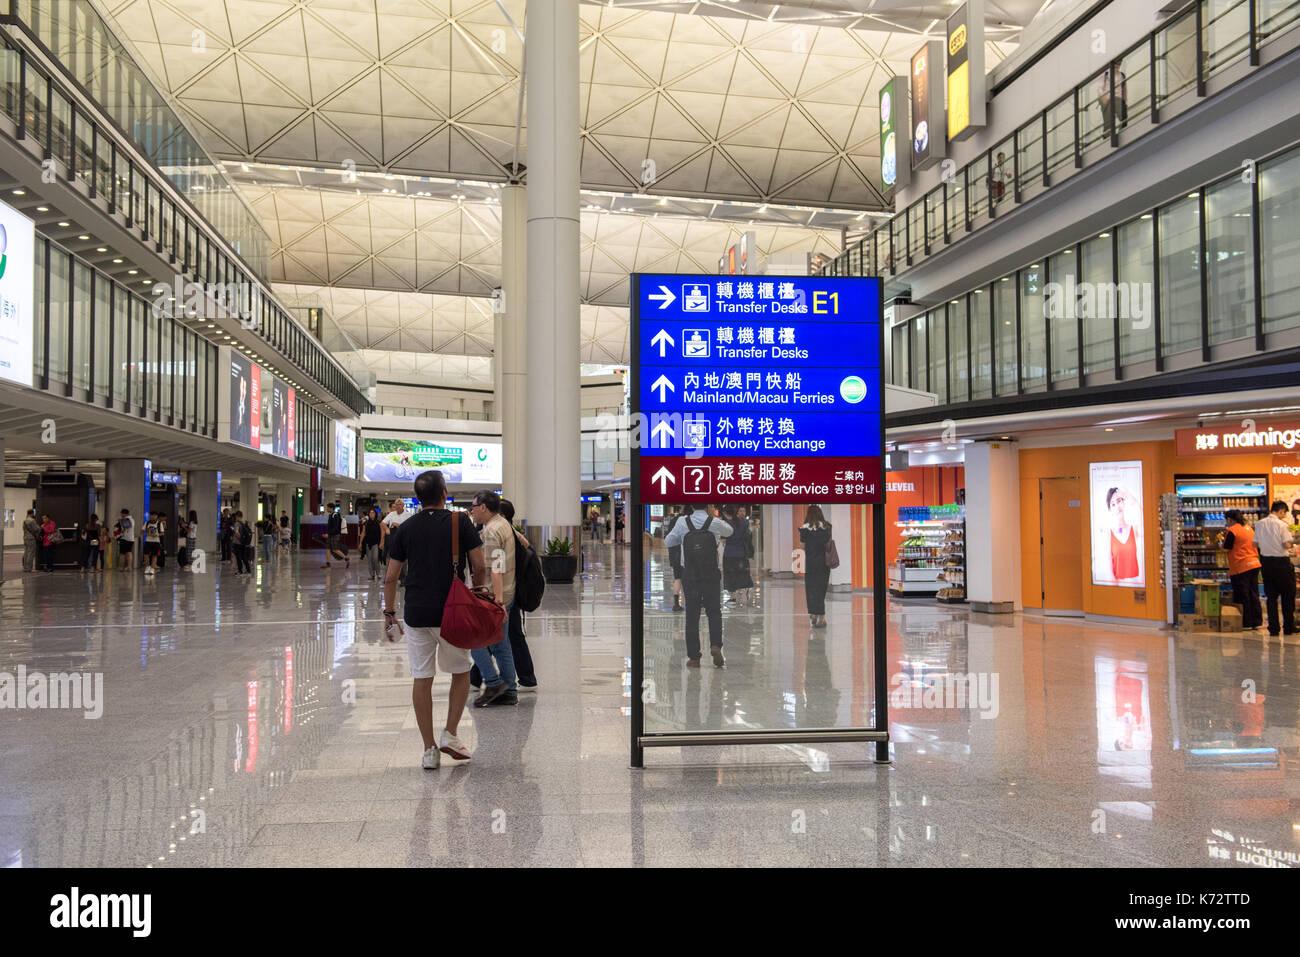 Airside arrivals area Hong Kong International Airport Check Lap Kok. Jayne Russell/Alamy Stock Photo - Stock Image